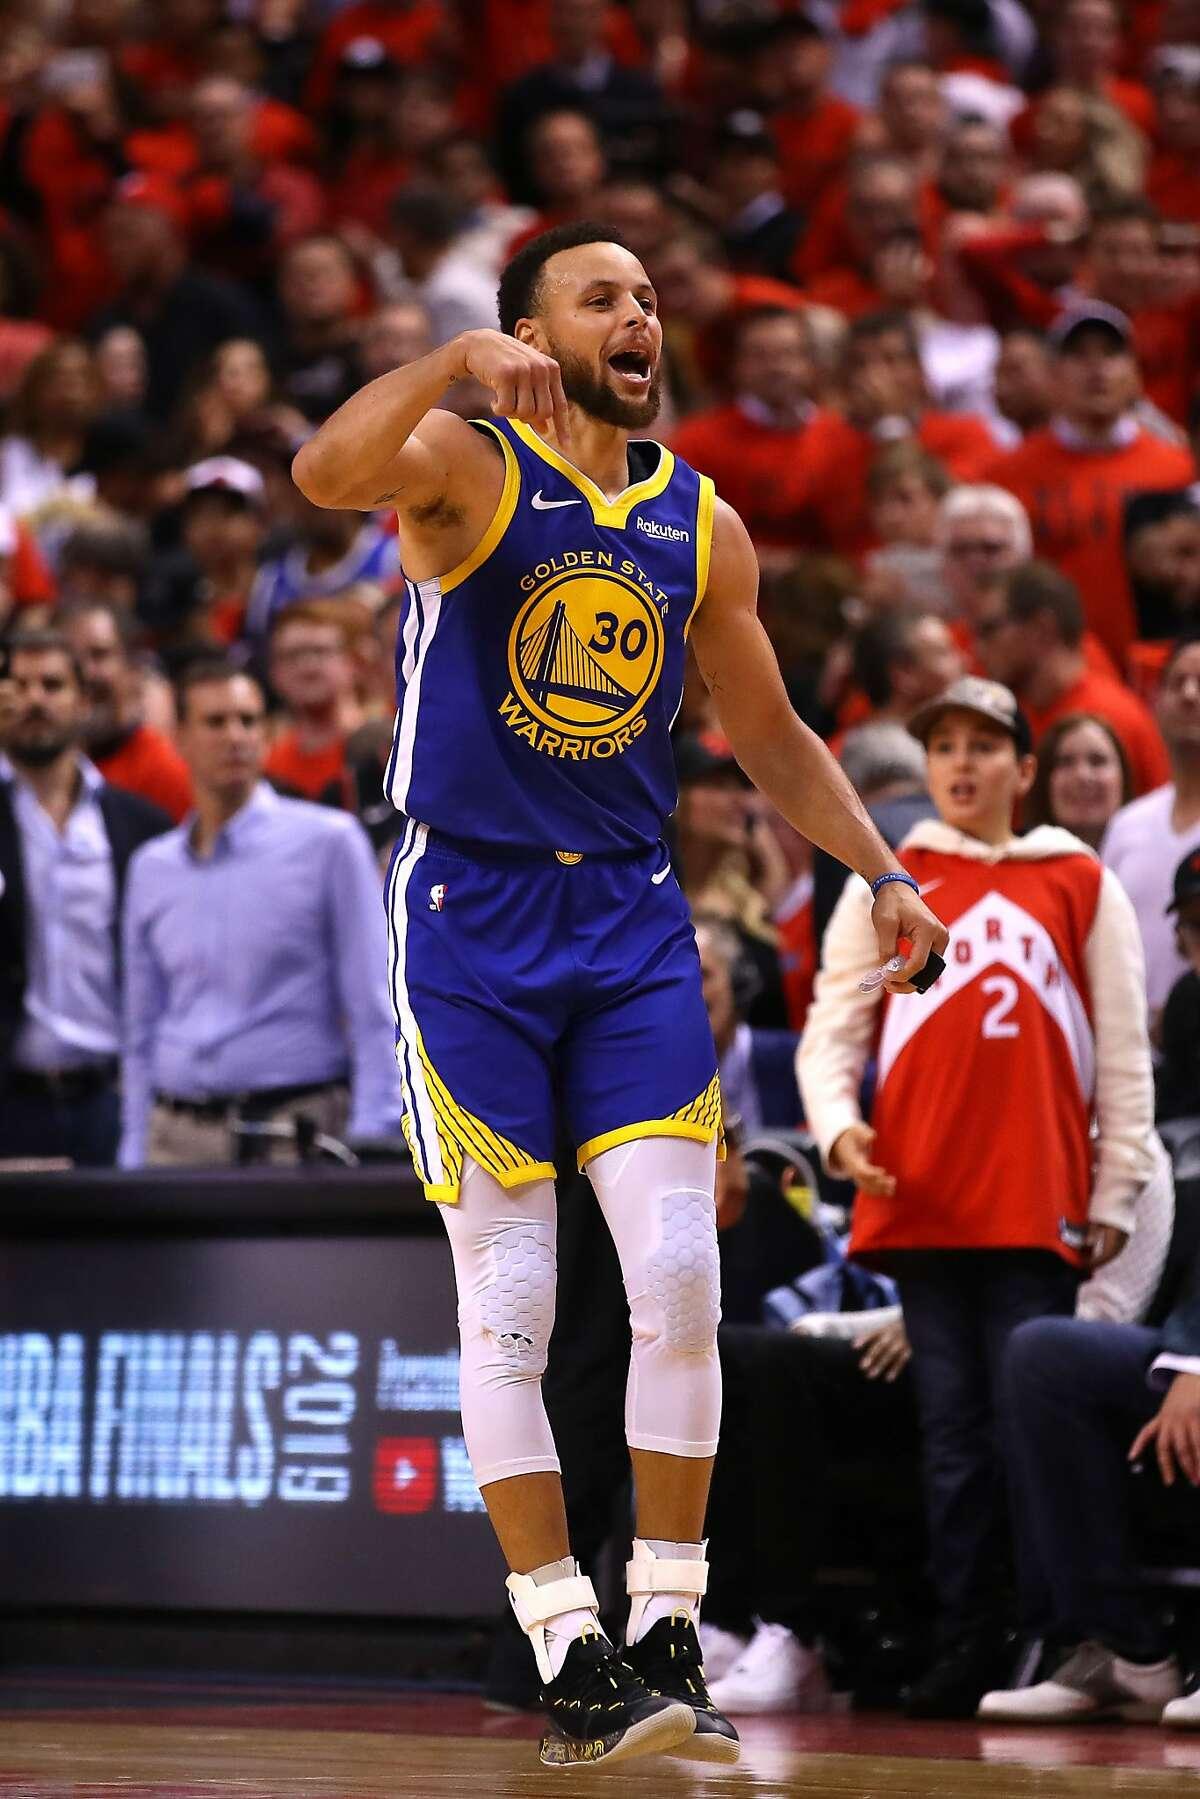 9. Stephen Curry Sport: Basketball Salary: $37.8 million Endorsements: $42 million Total earnings: $79.8 million